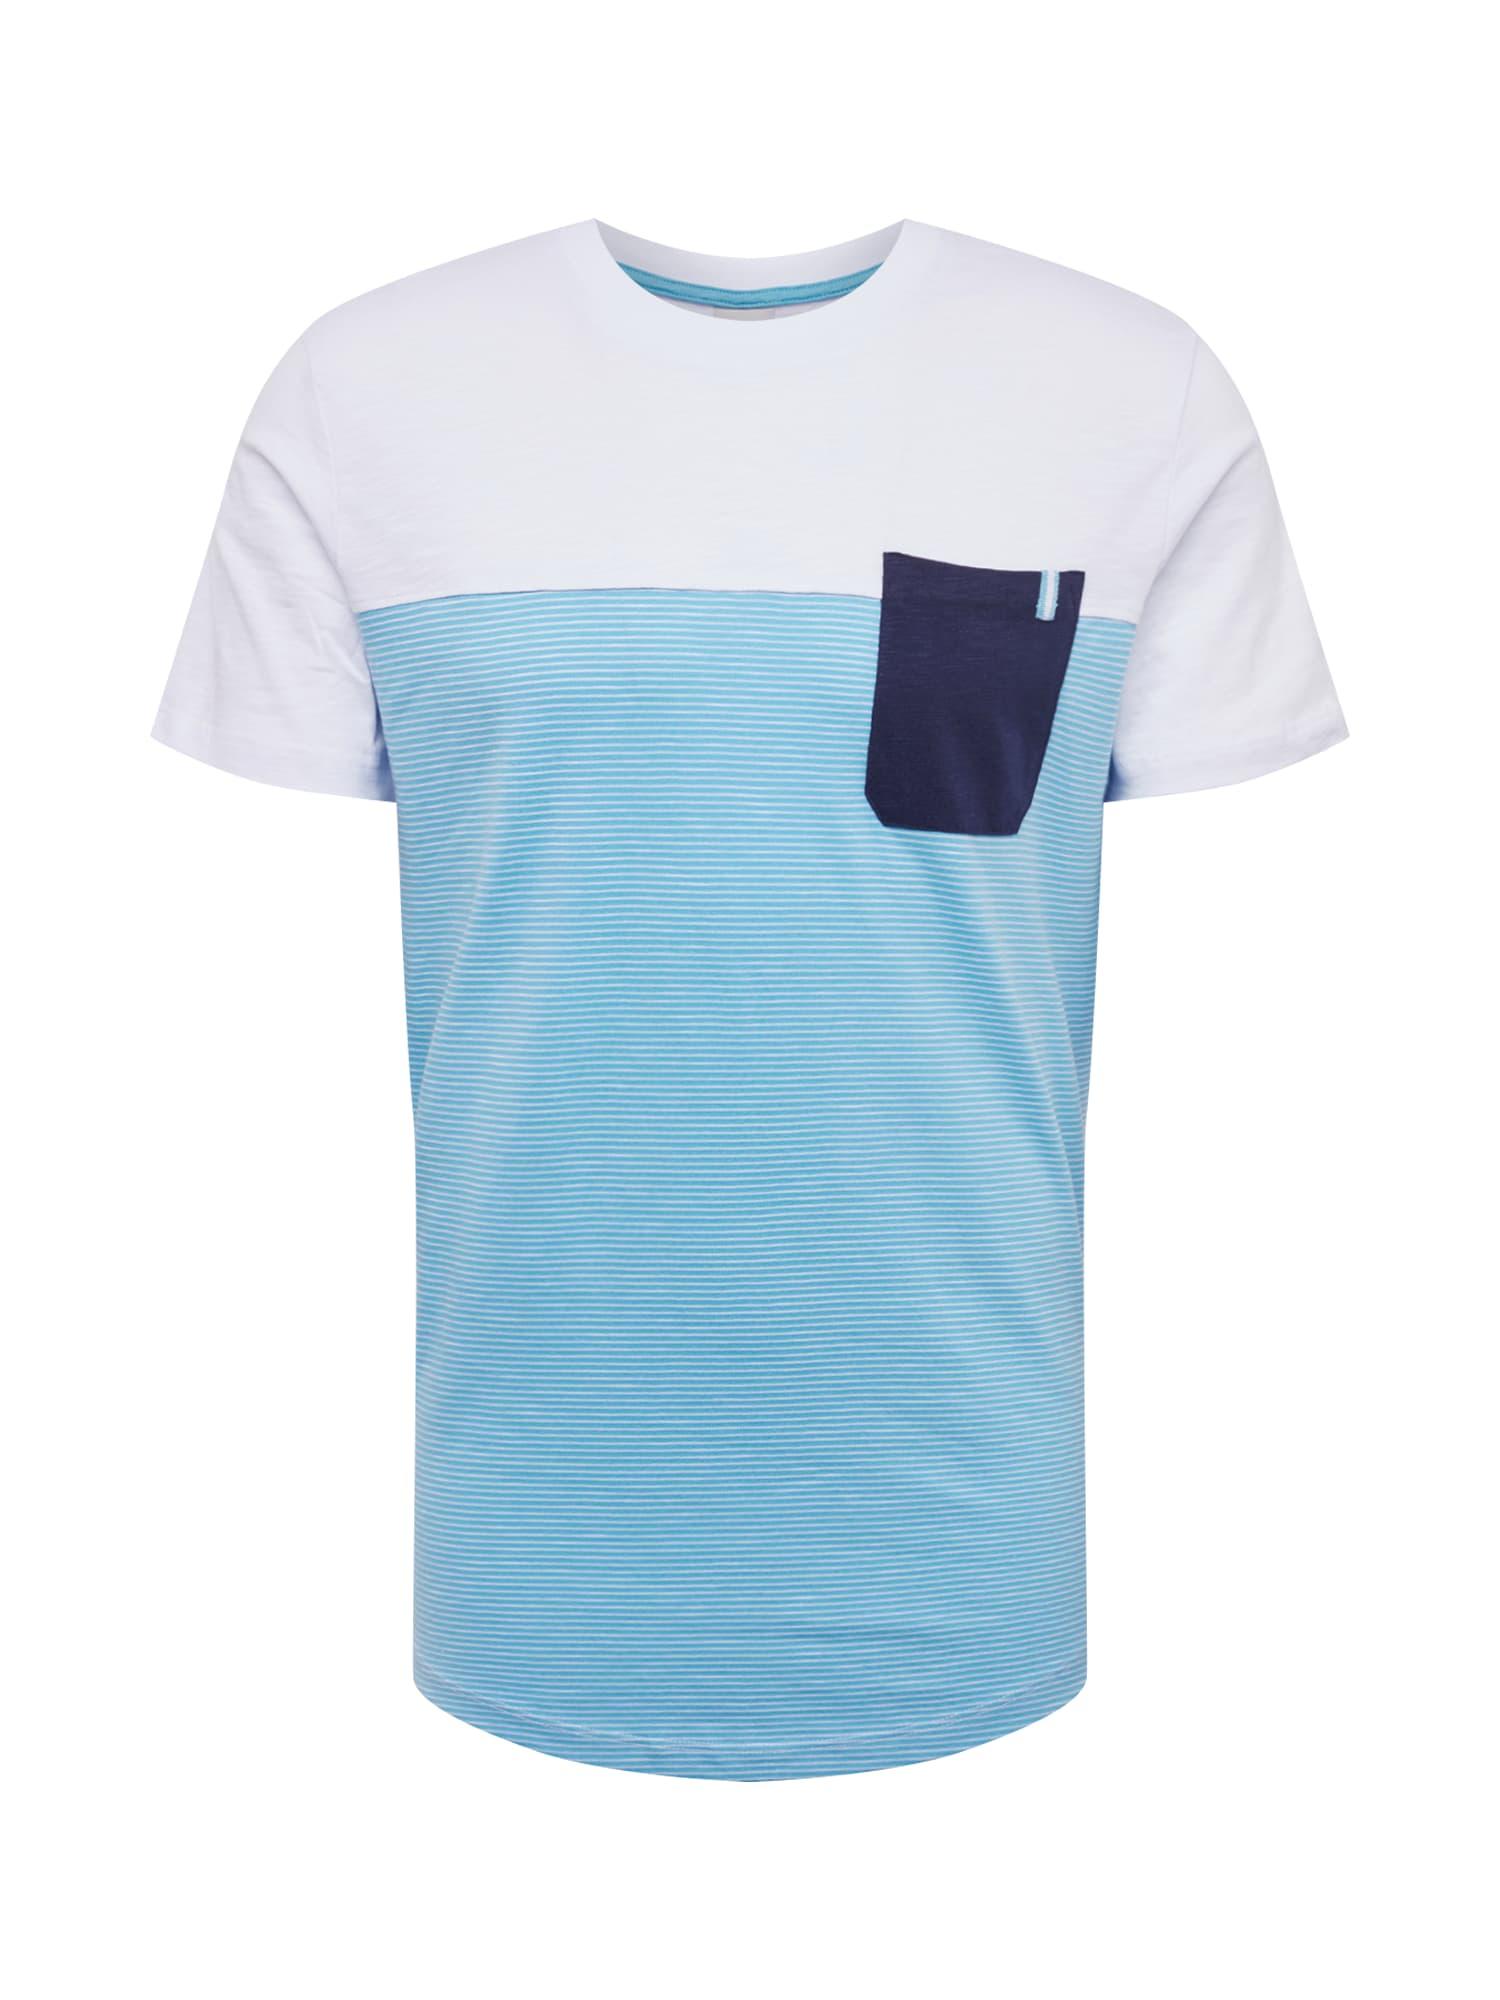 Tričko COSECT aqua modrá bílá JACK & JONES